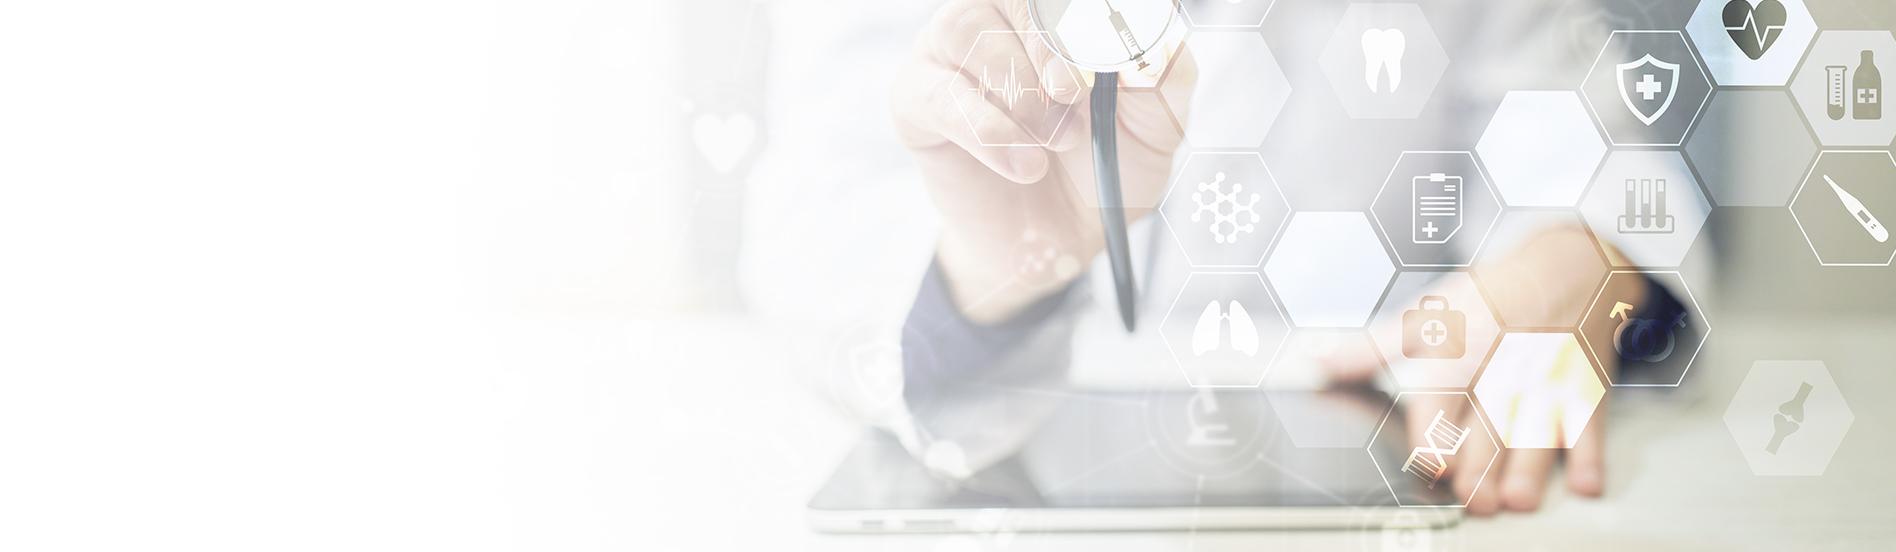 Doctor Technology Data